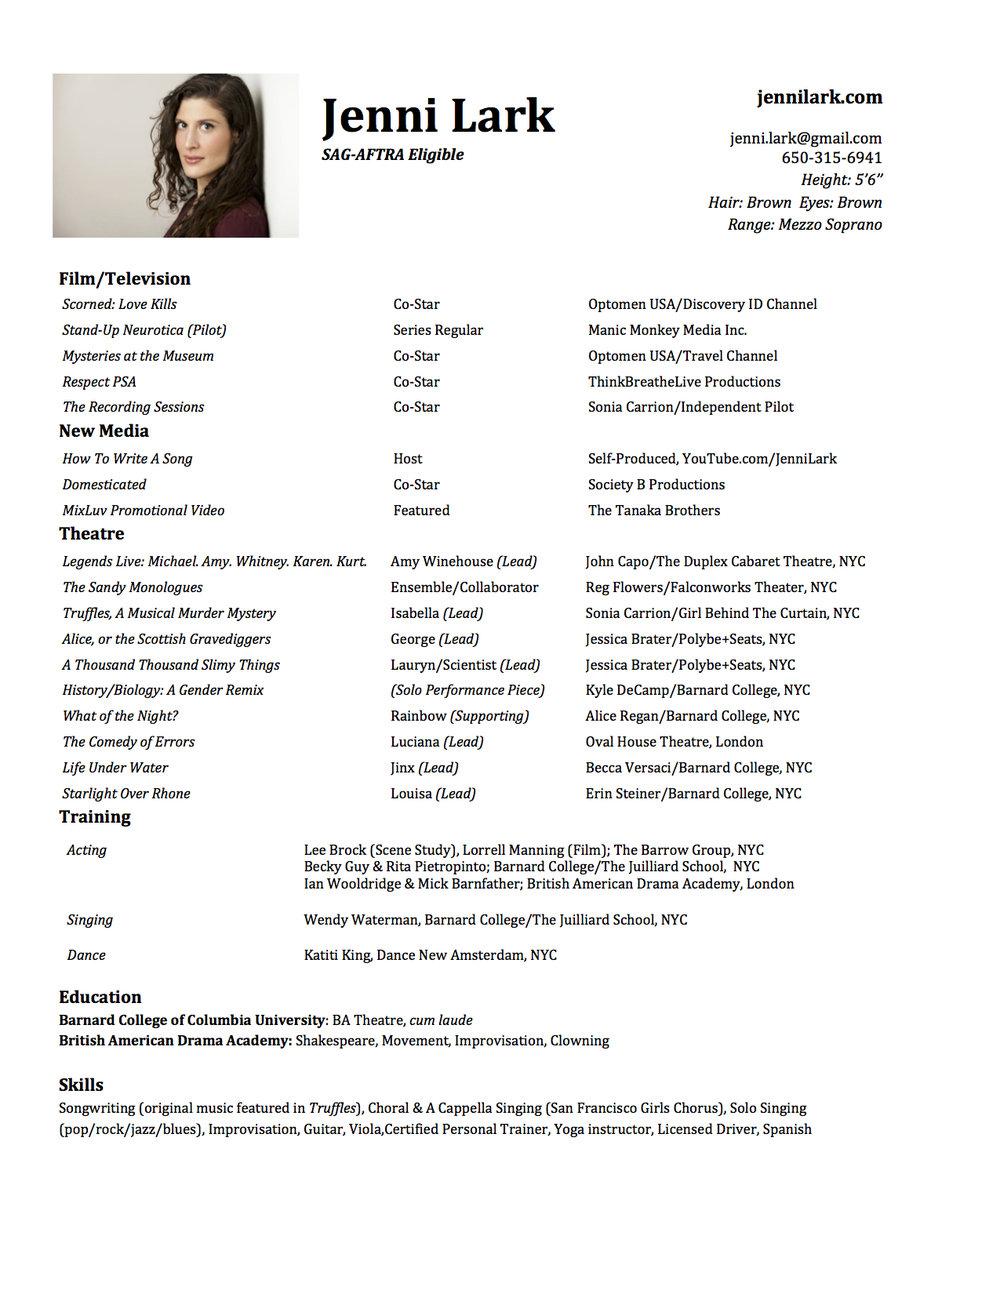 Jenni Lark acting resume 2017.jpg